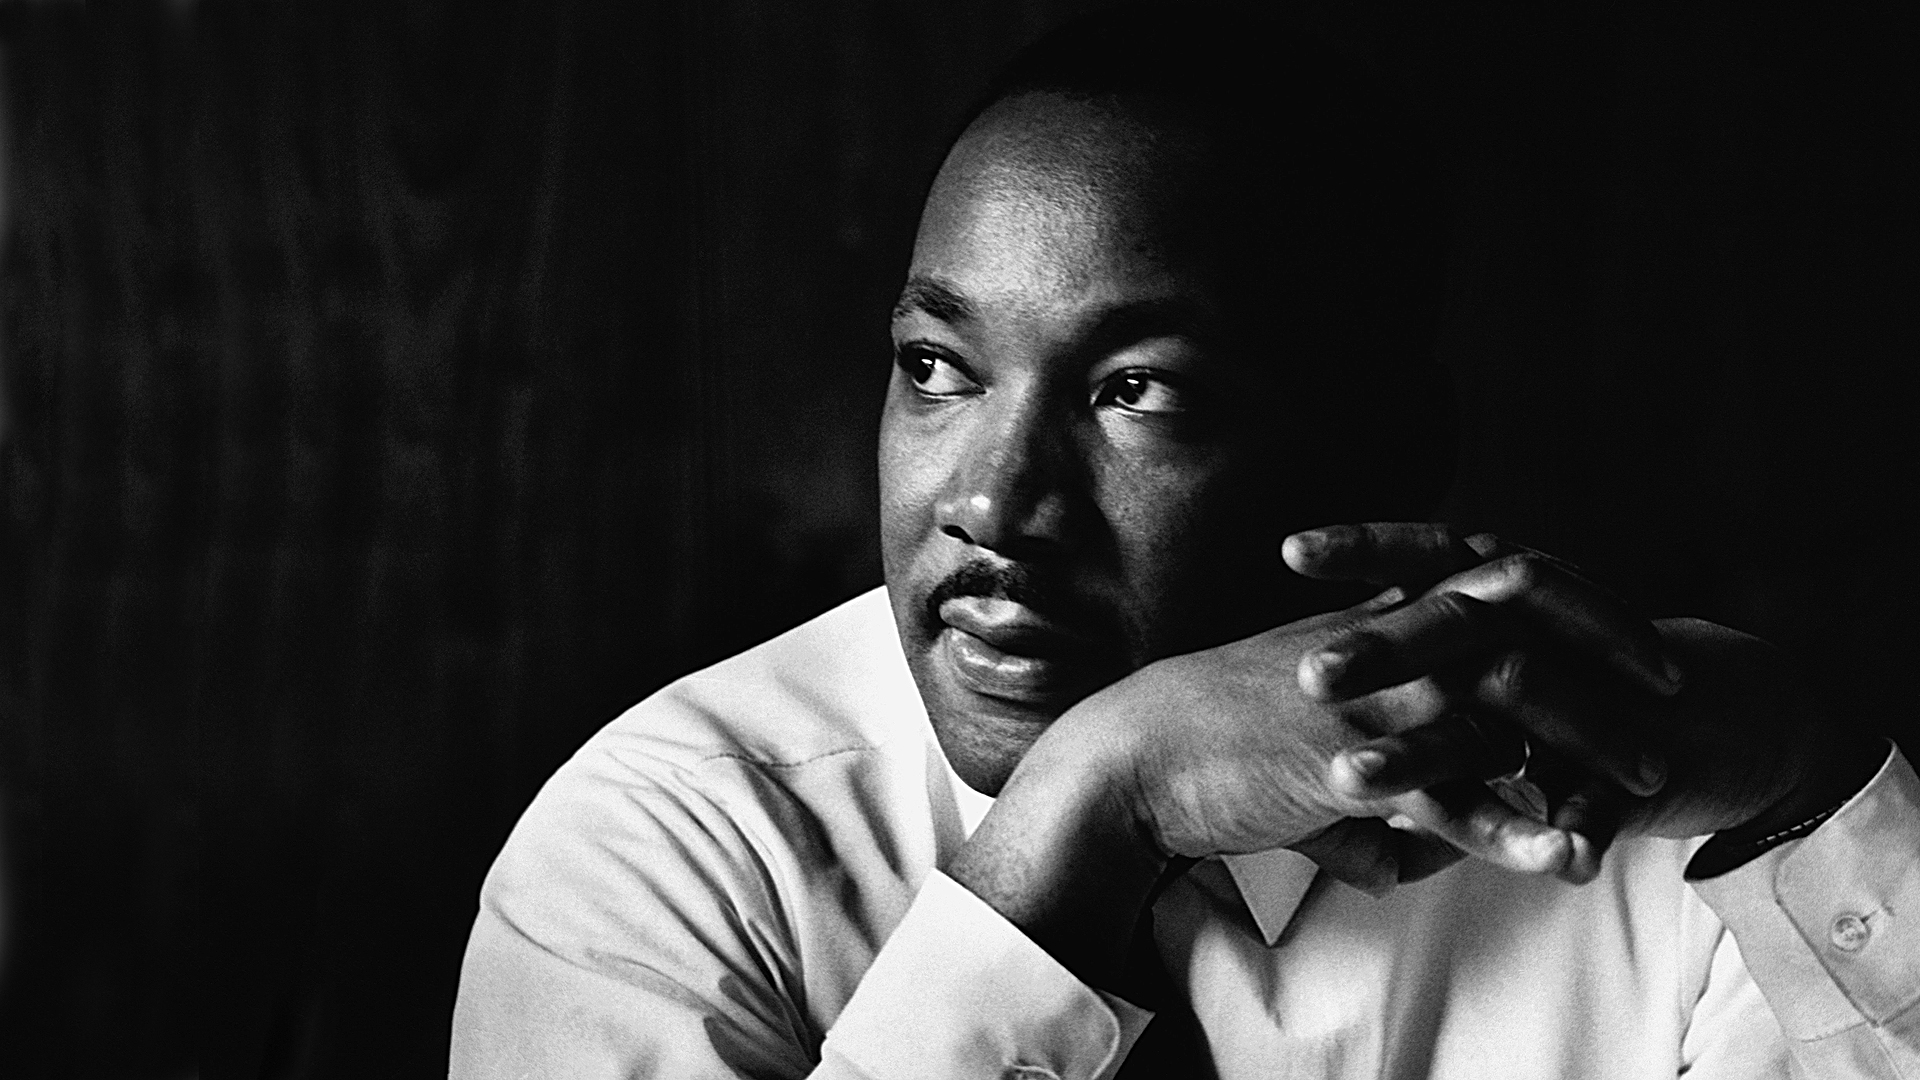 AUDIO & TRANSCRIPT: Dr. King: Drum Major Instinct (1968)